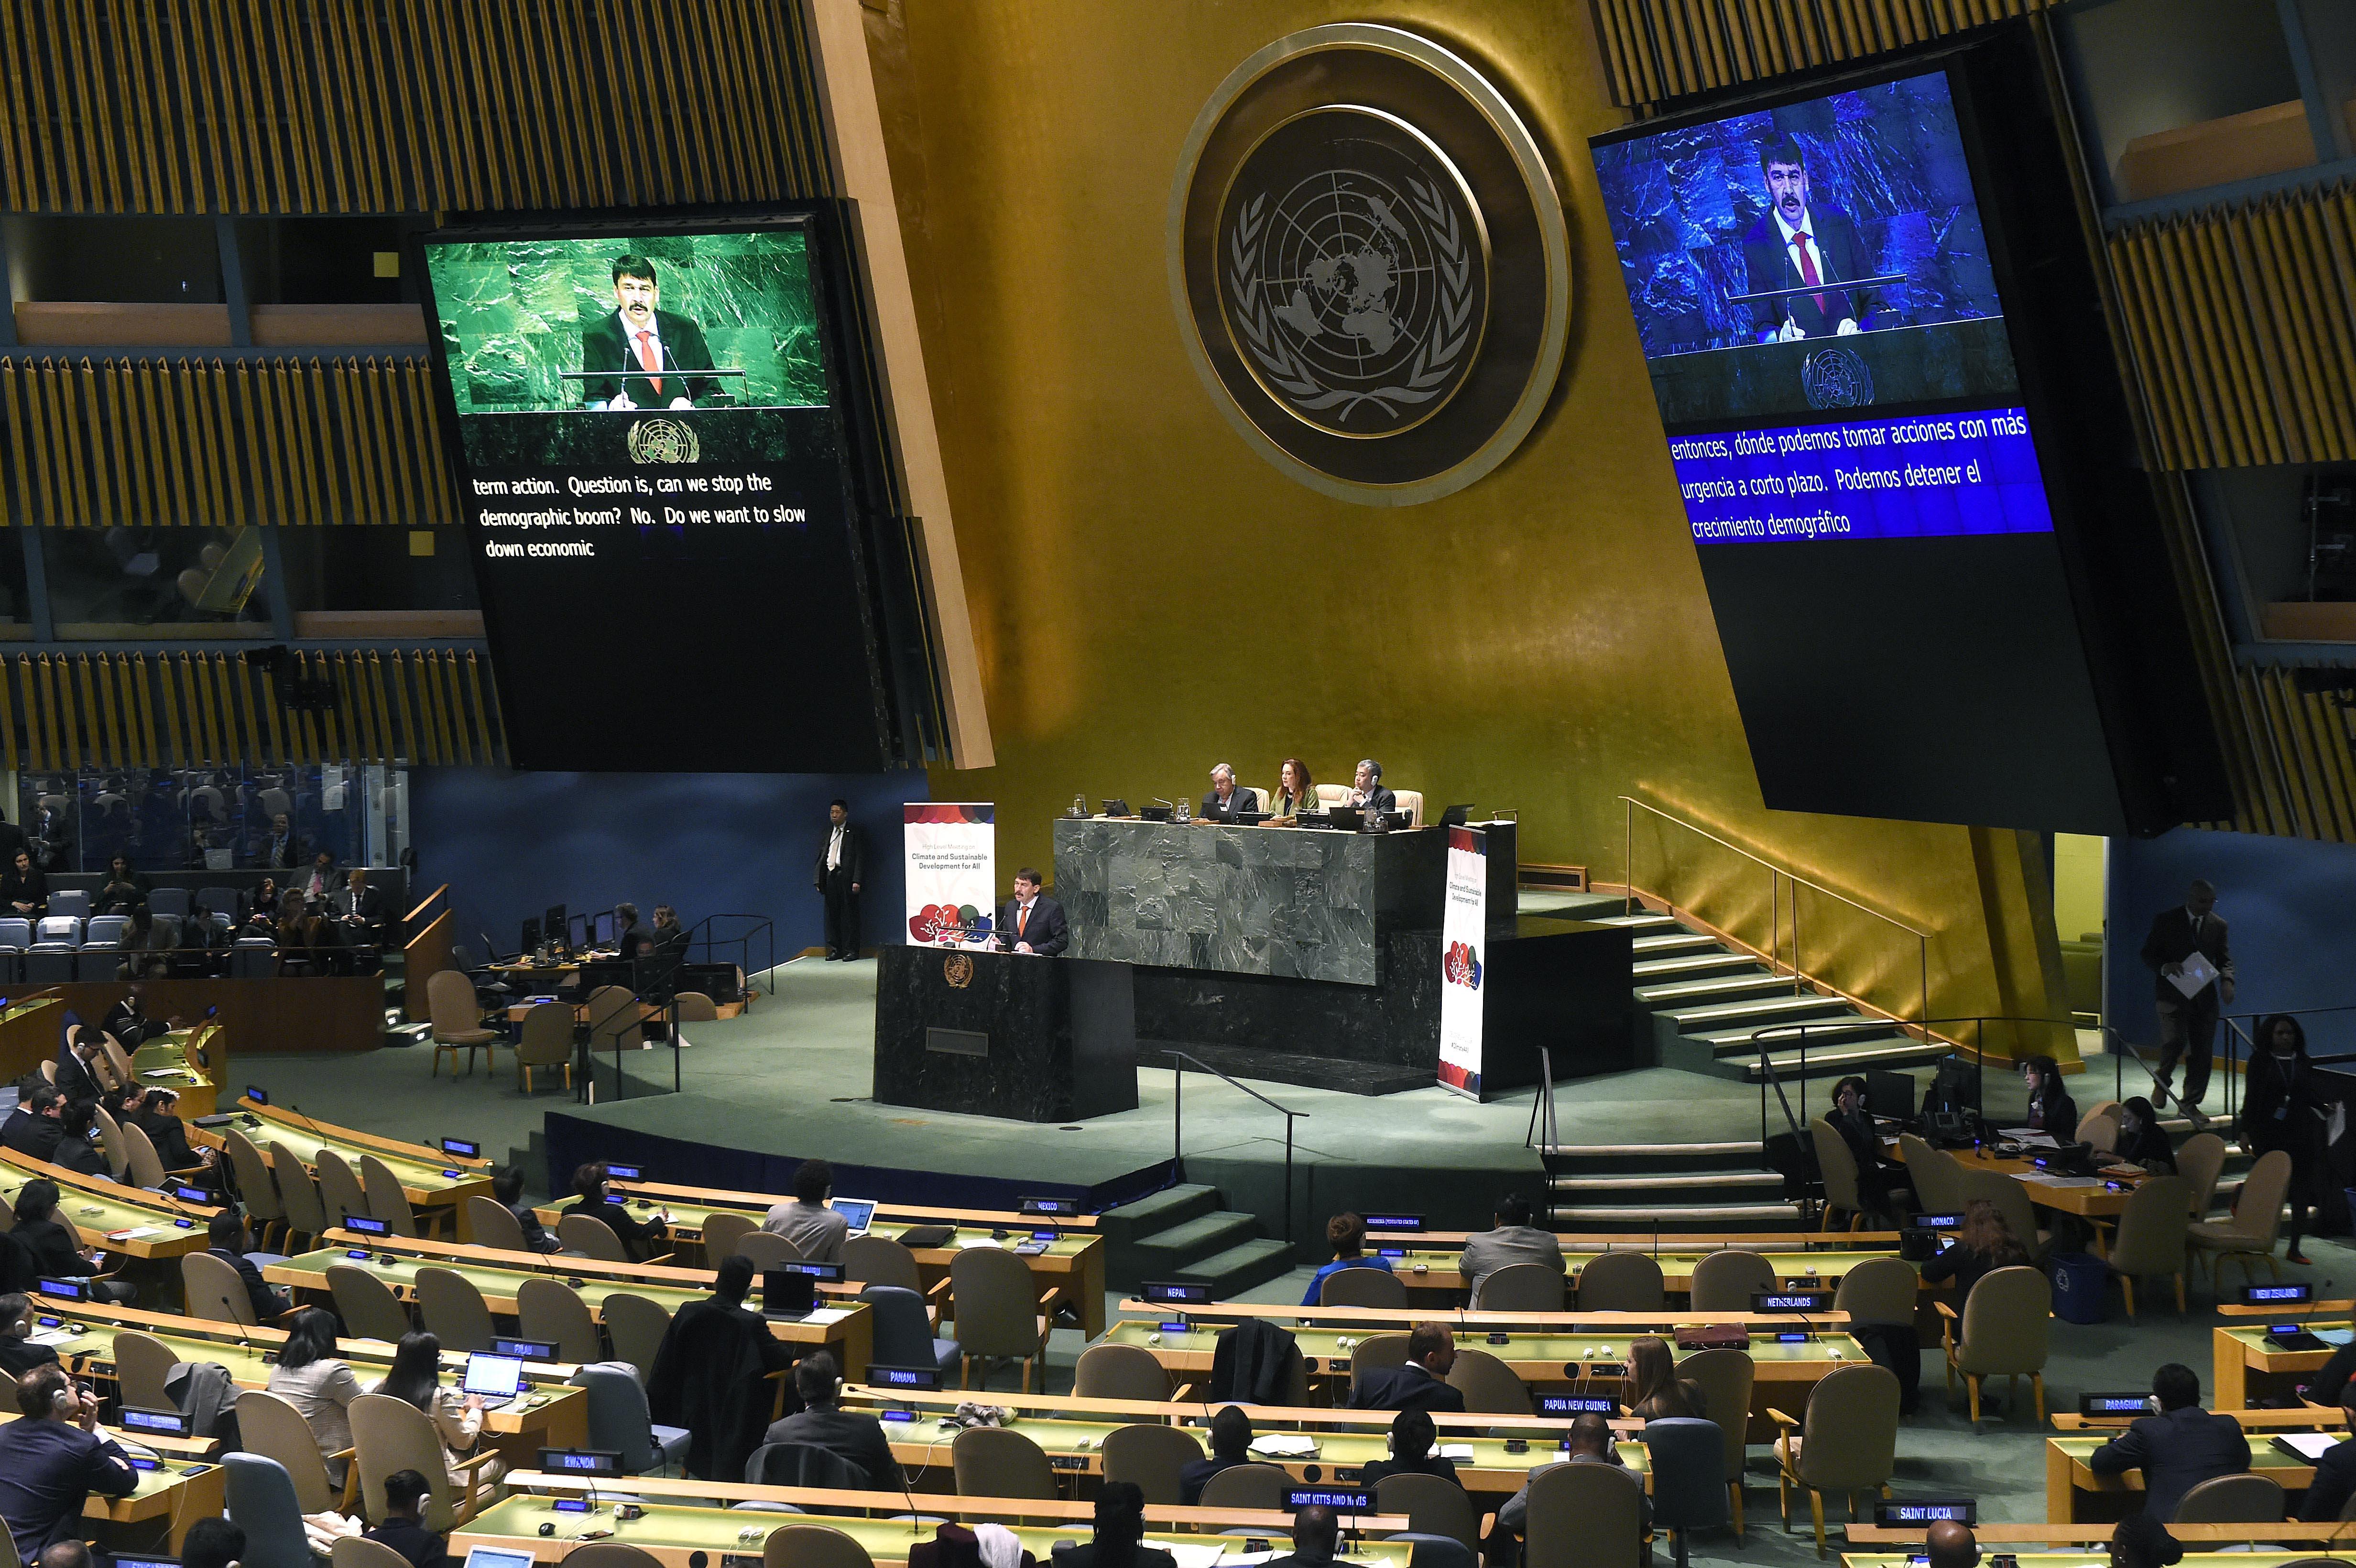 hungarian president in UN